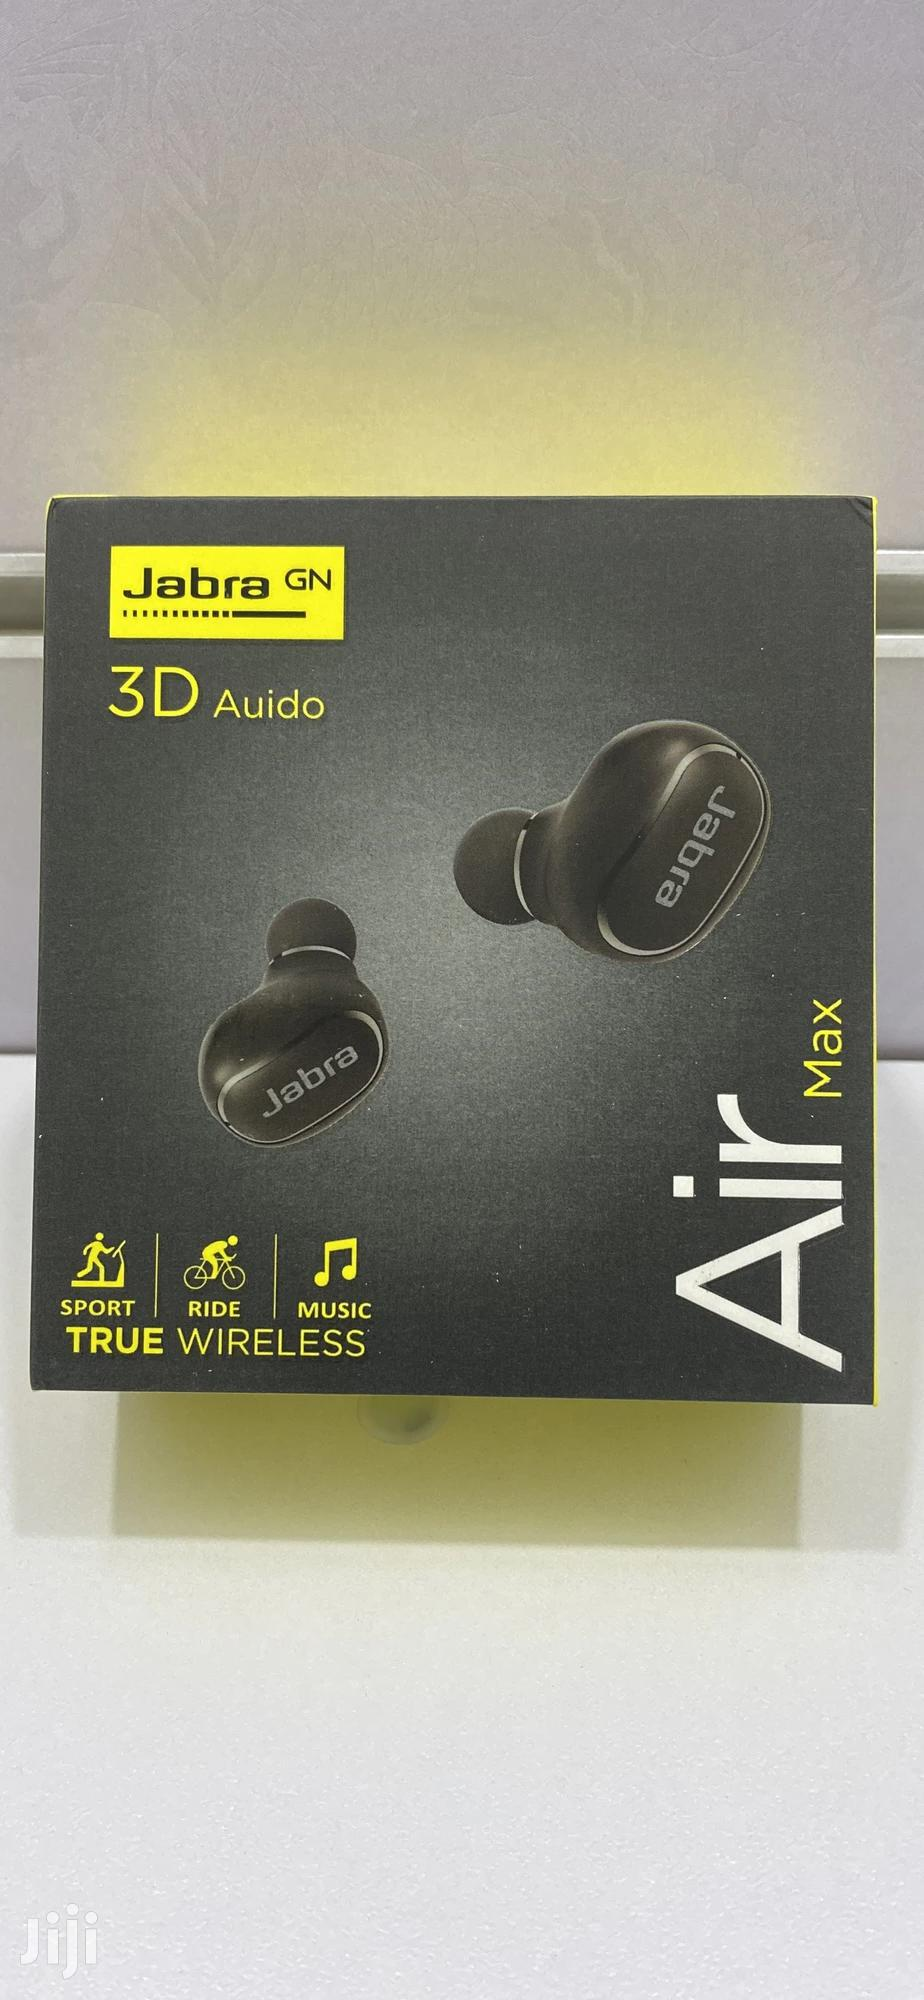 Jabra Air Max 3D Audio Wireless Bluetooth Earbuds Airdots